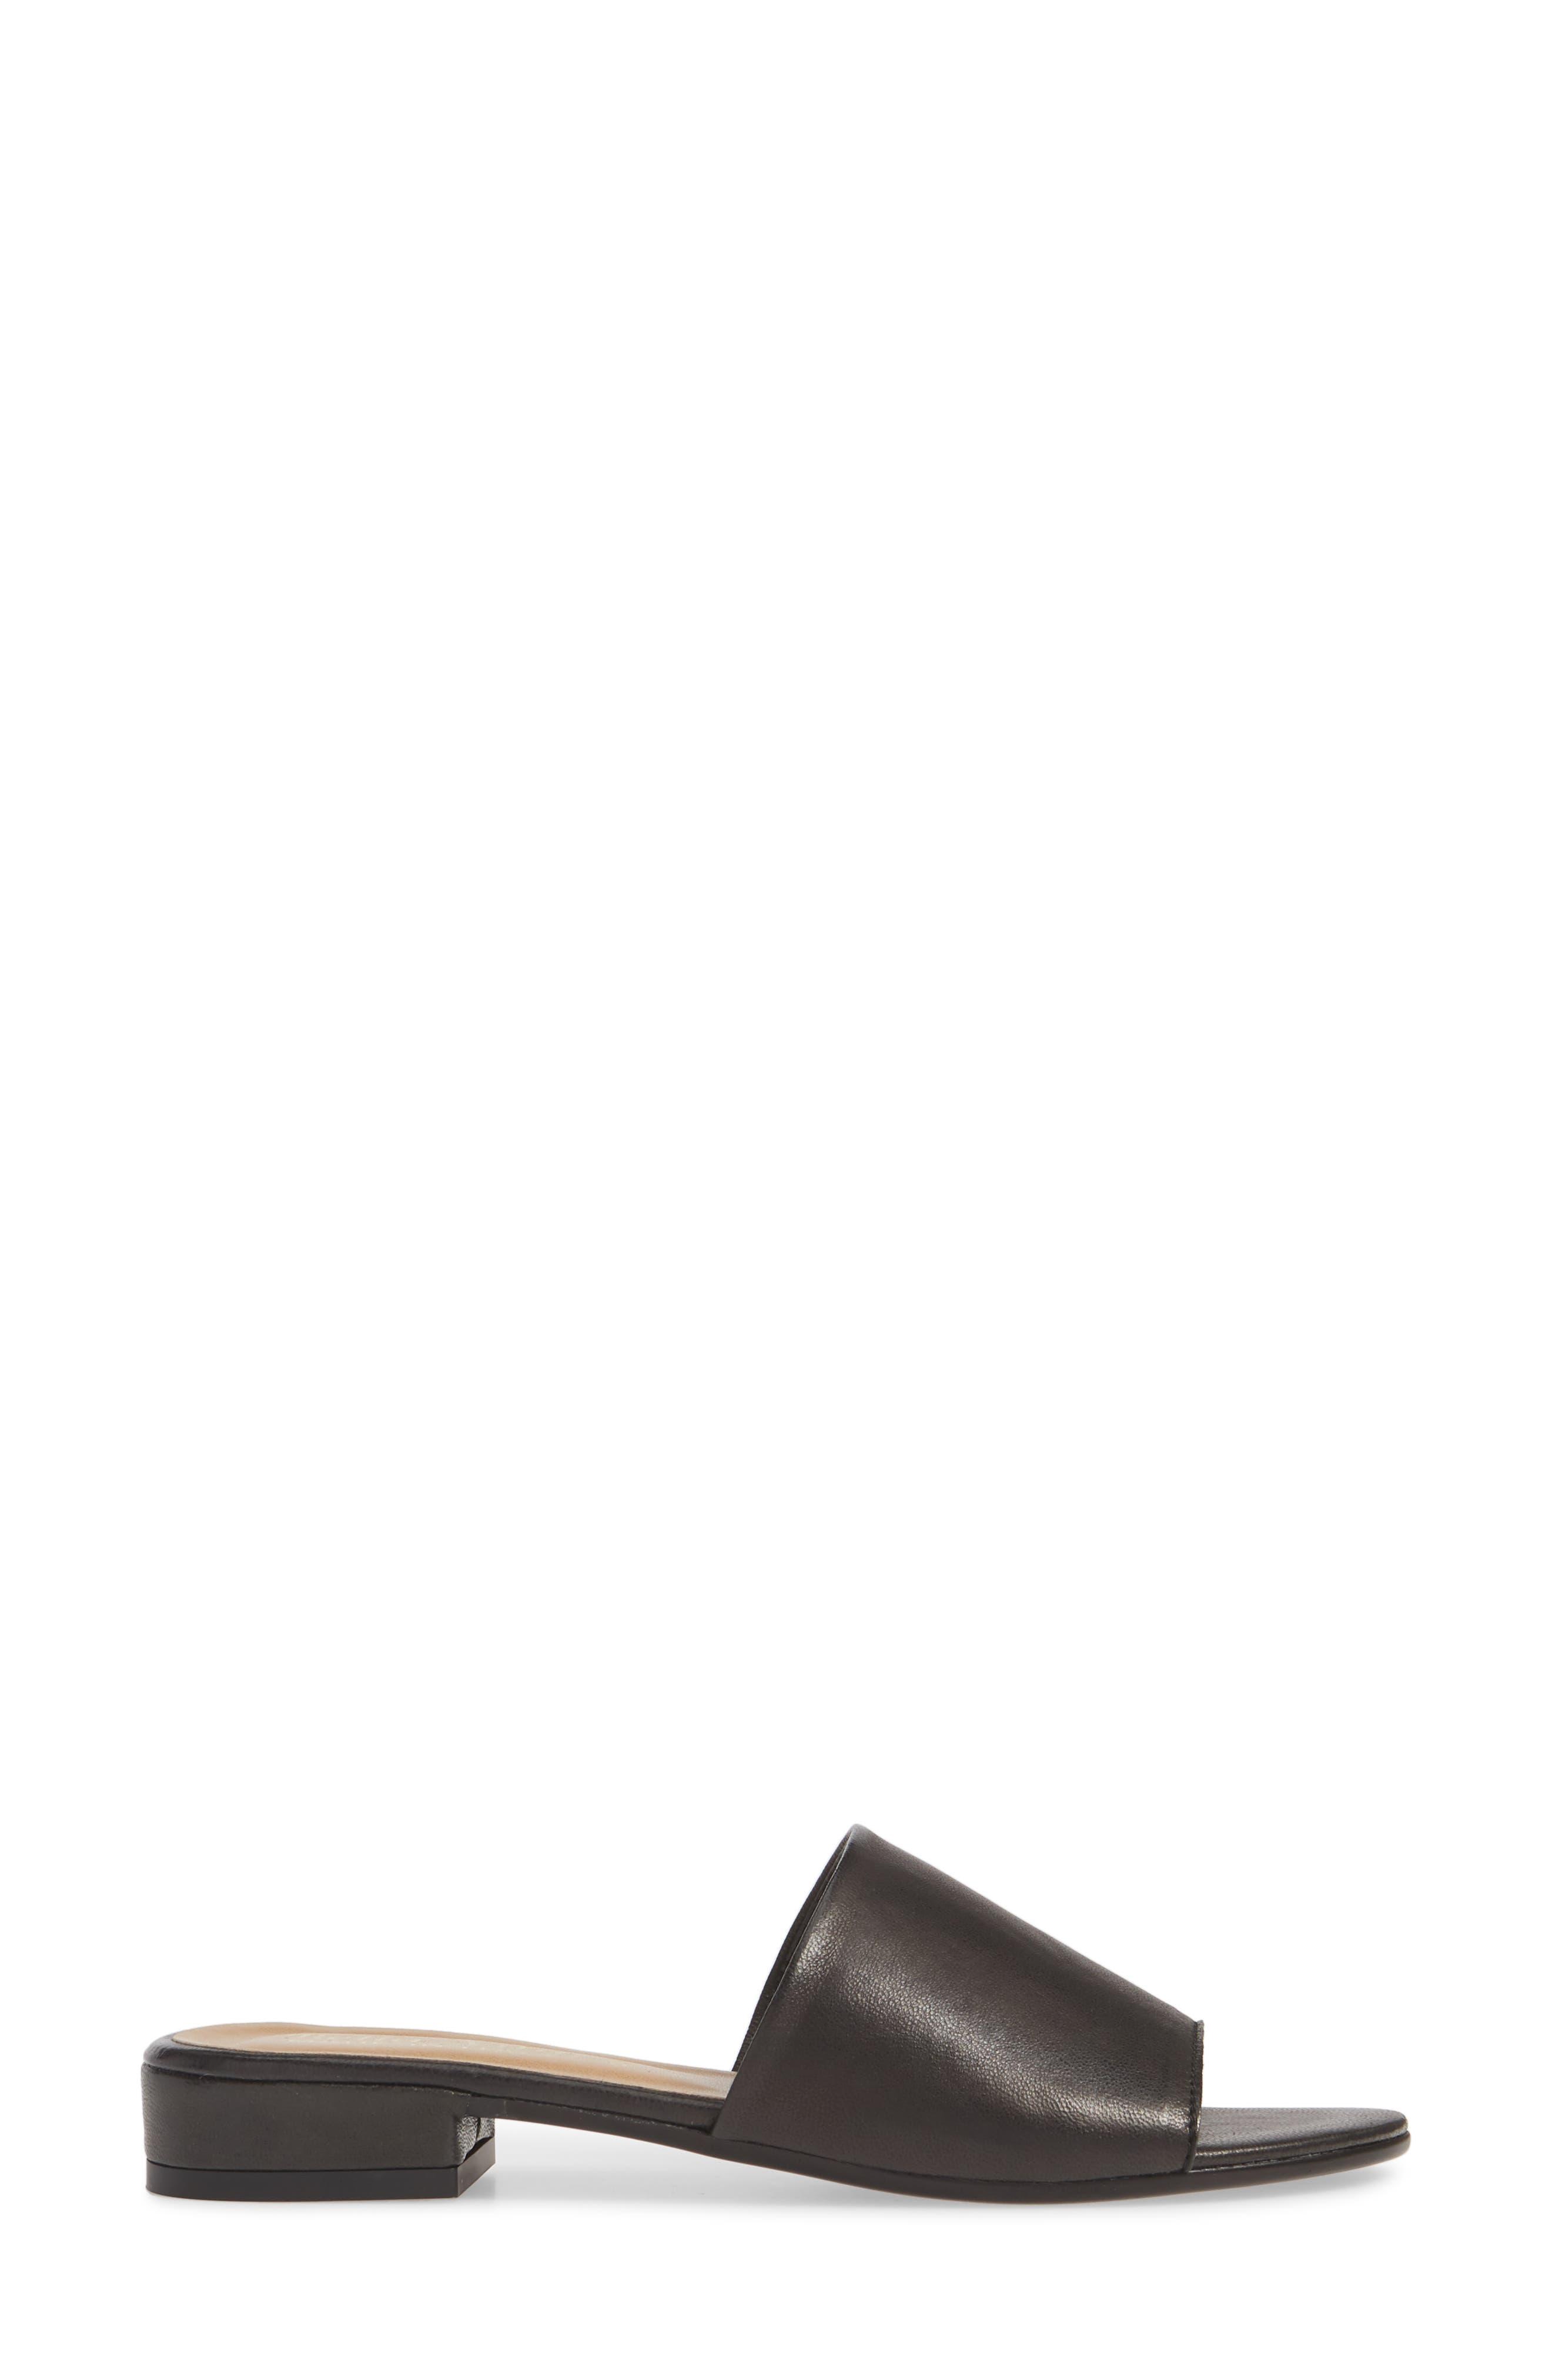 BELLA VITA, Slide Sandal, Alternate thumbnail 3, color, BLACK ITALIAN LEATHER